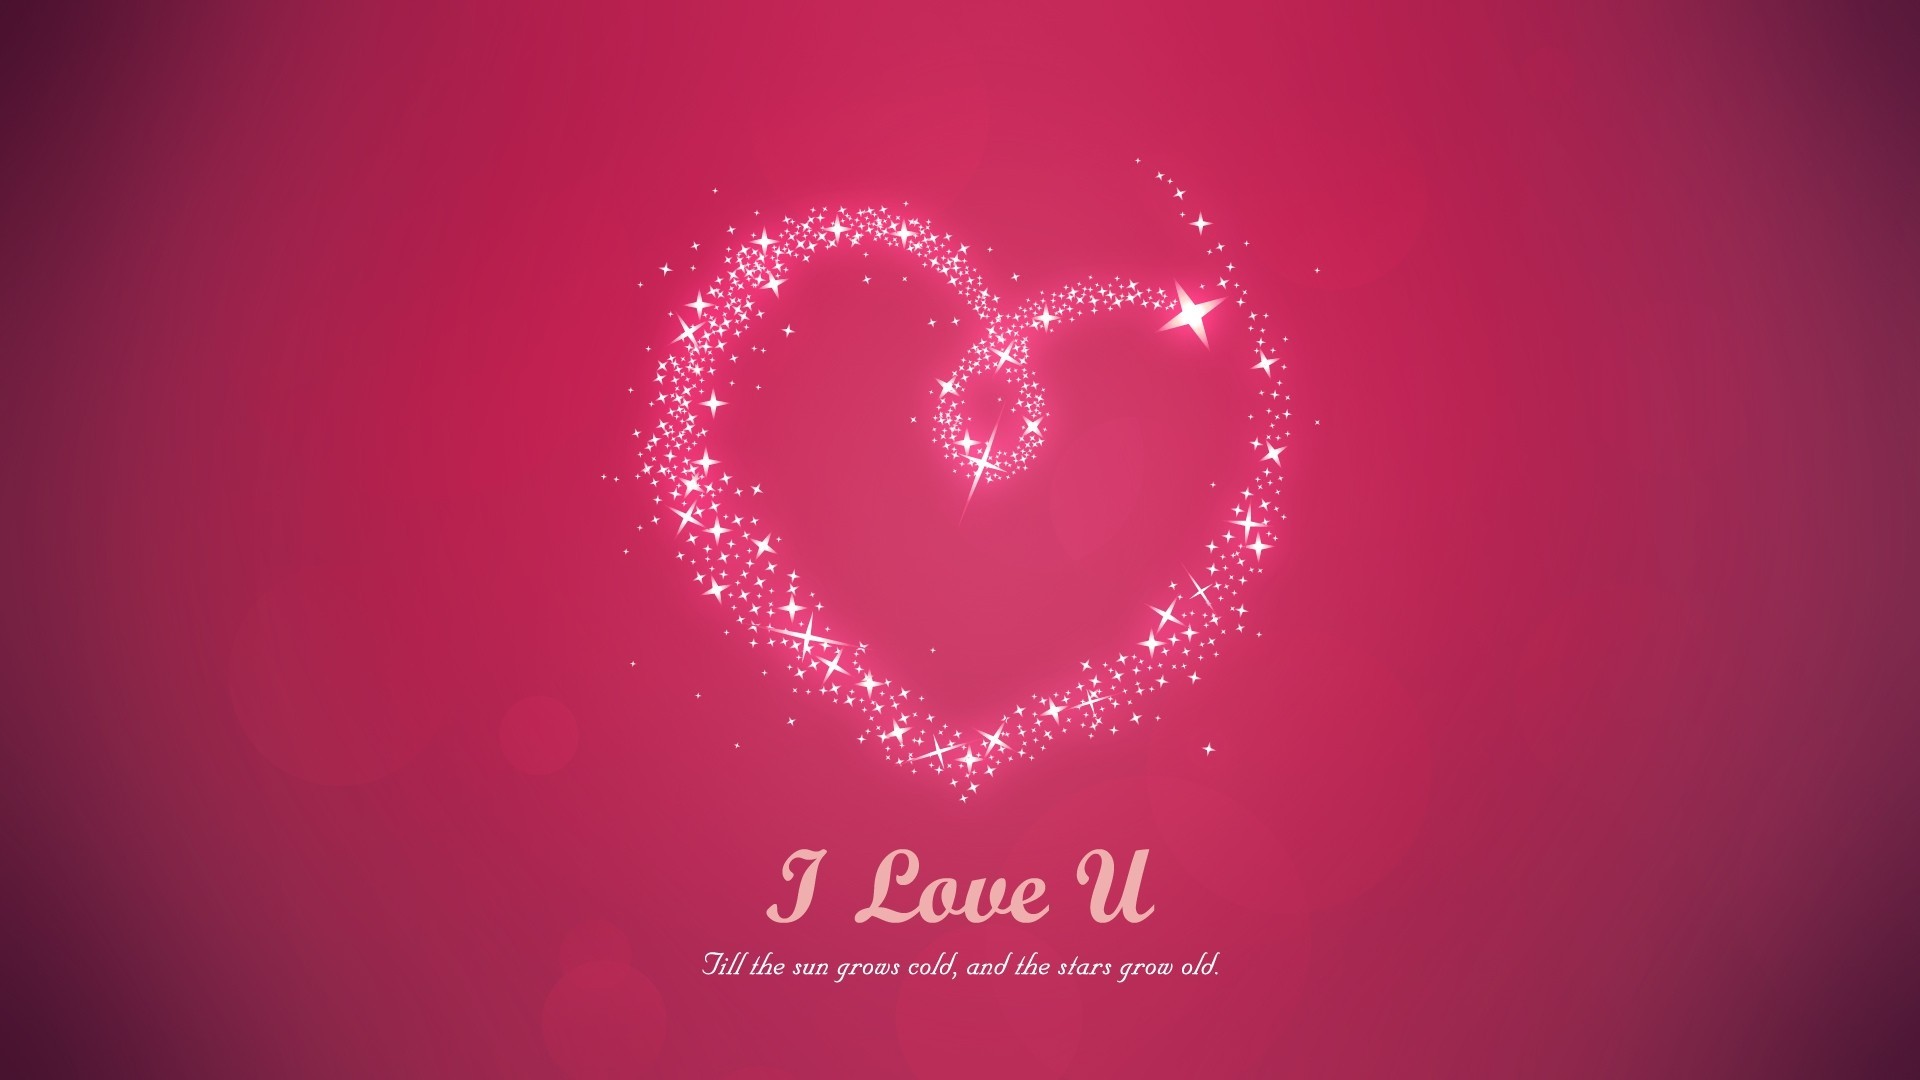 I love you mom beautiful pink image